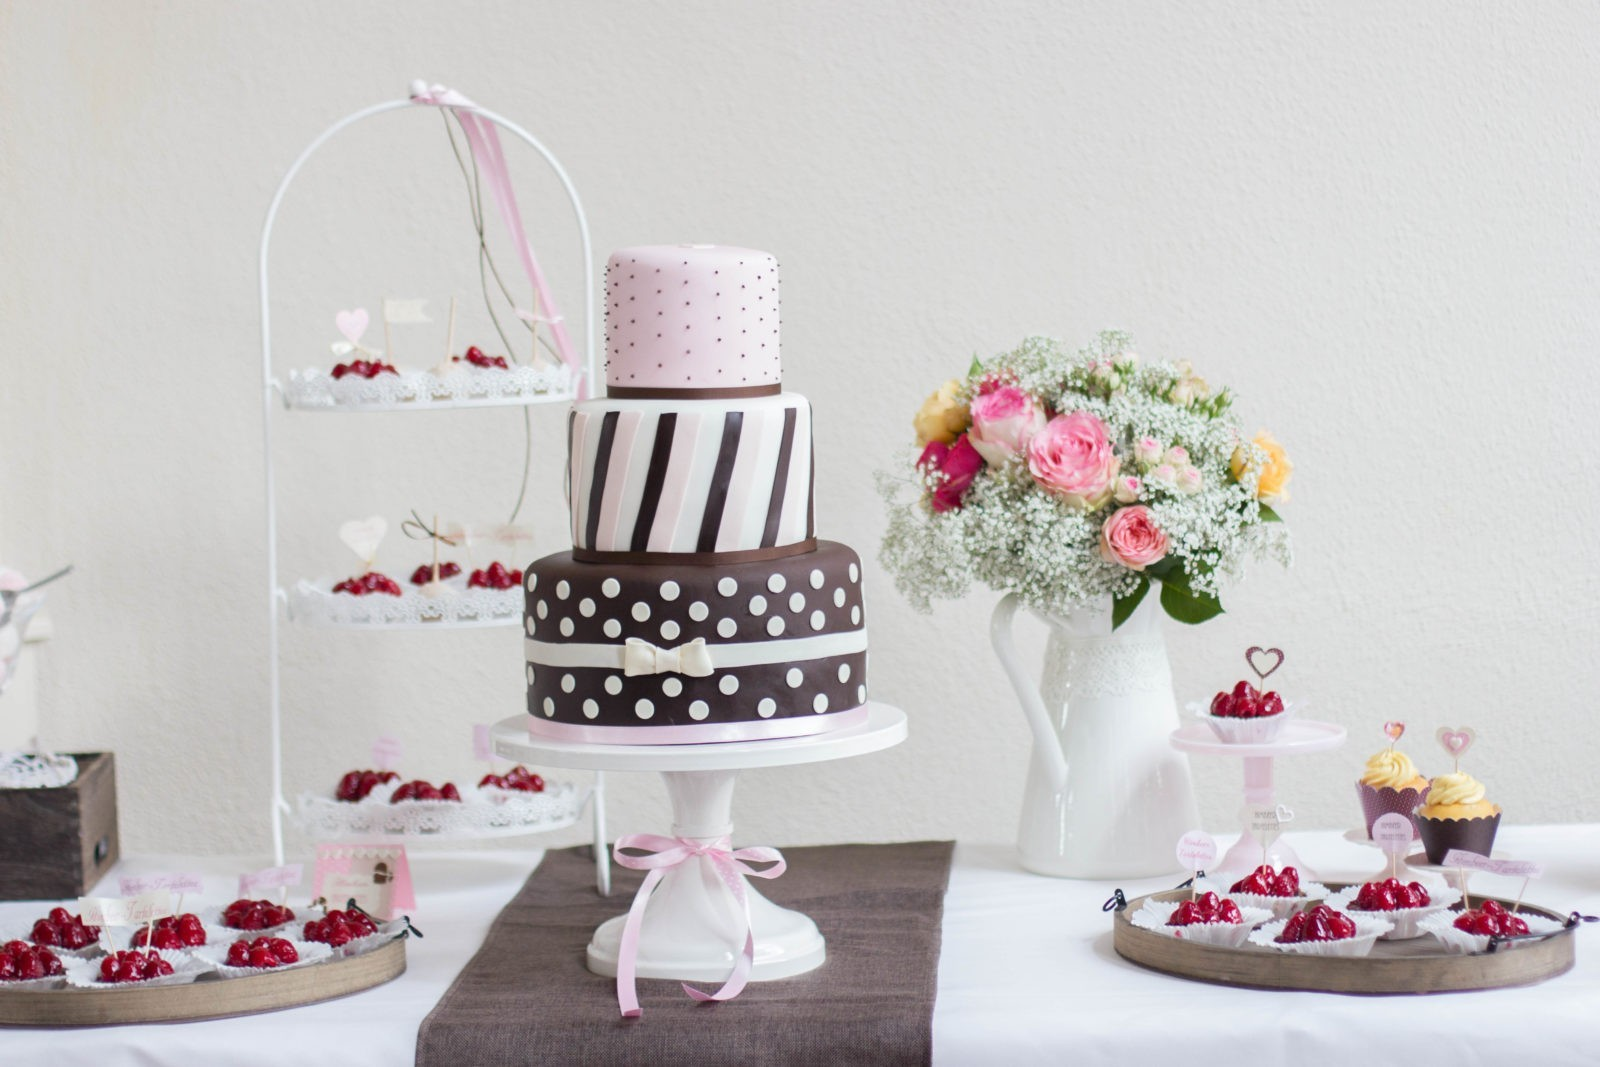 Sweet Candy Table rosa-cremeweiß- braun